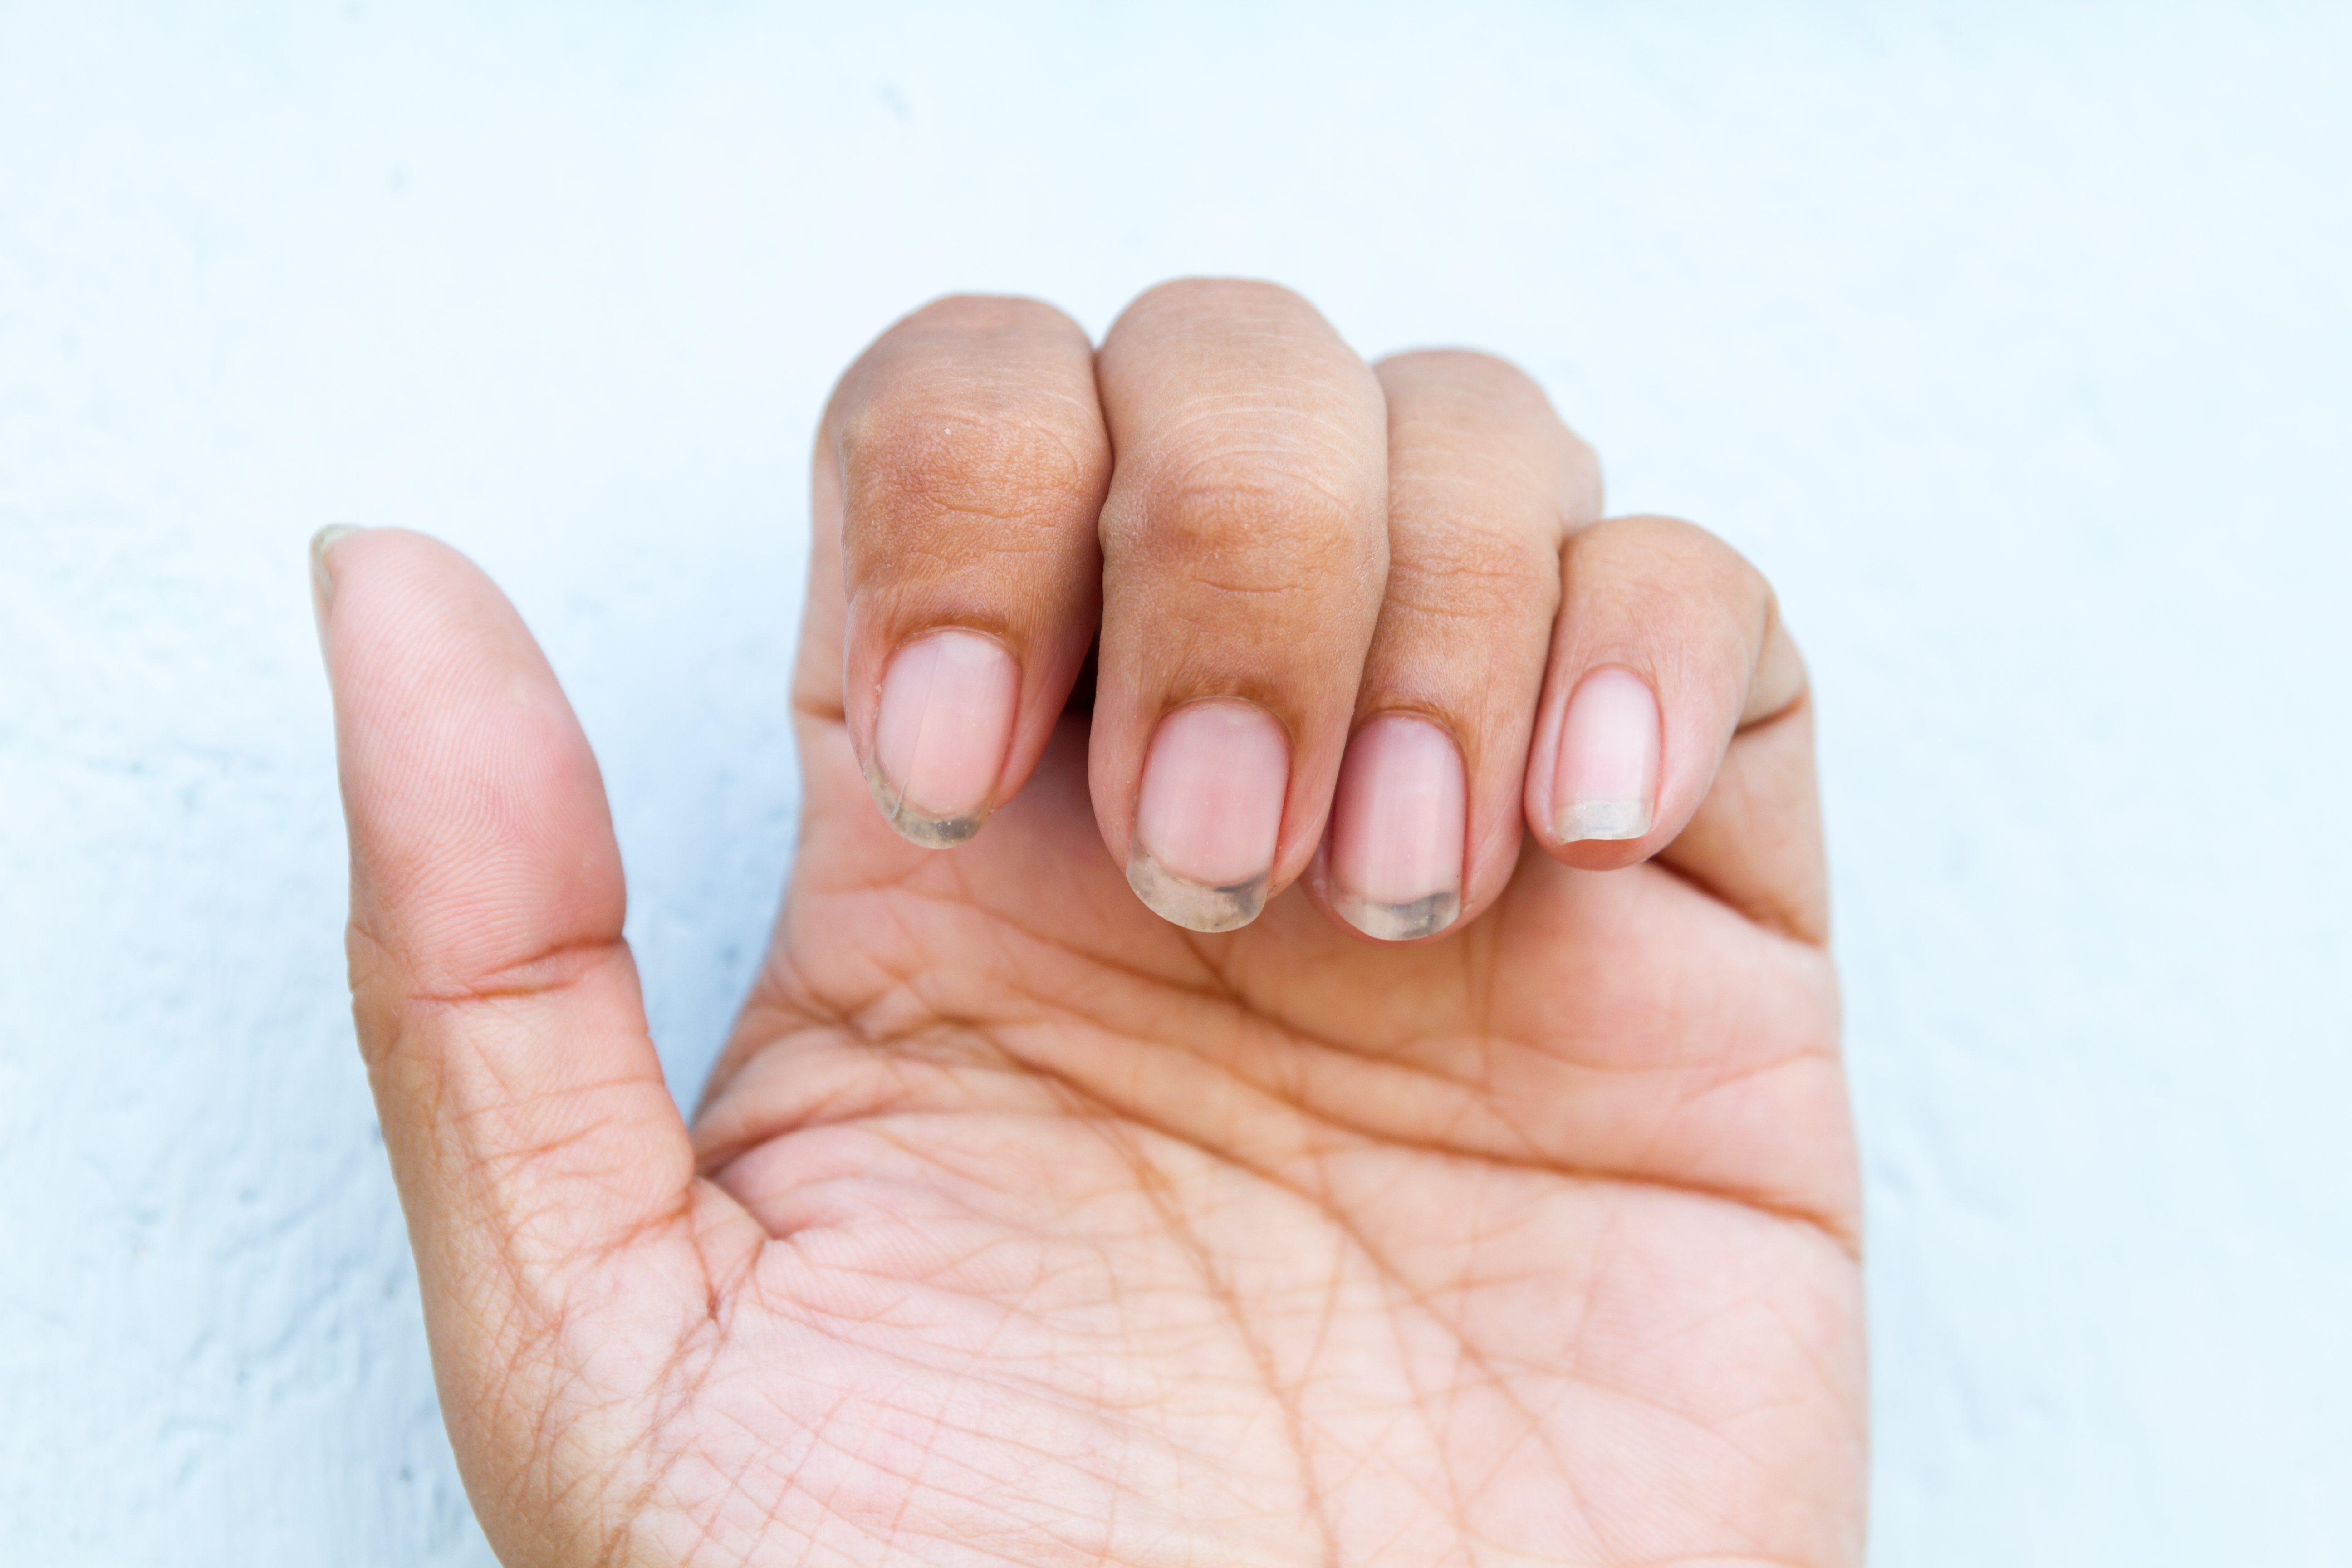 tratament pentru poliartrita reumatoida plan